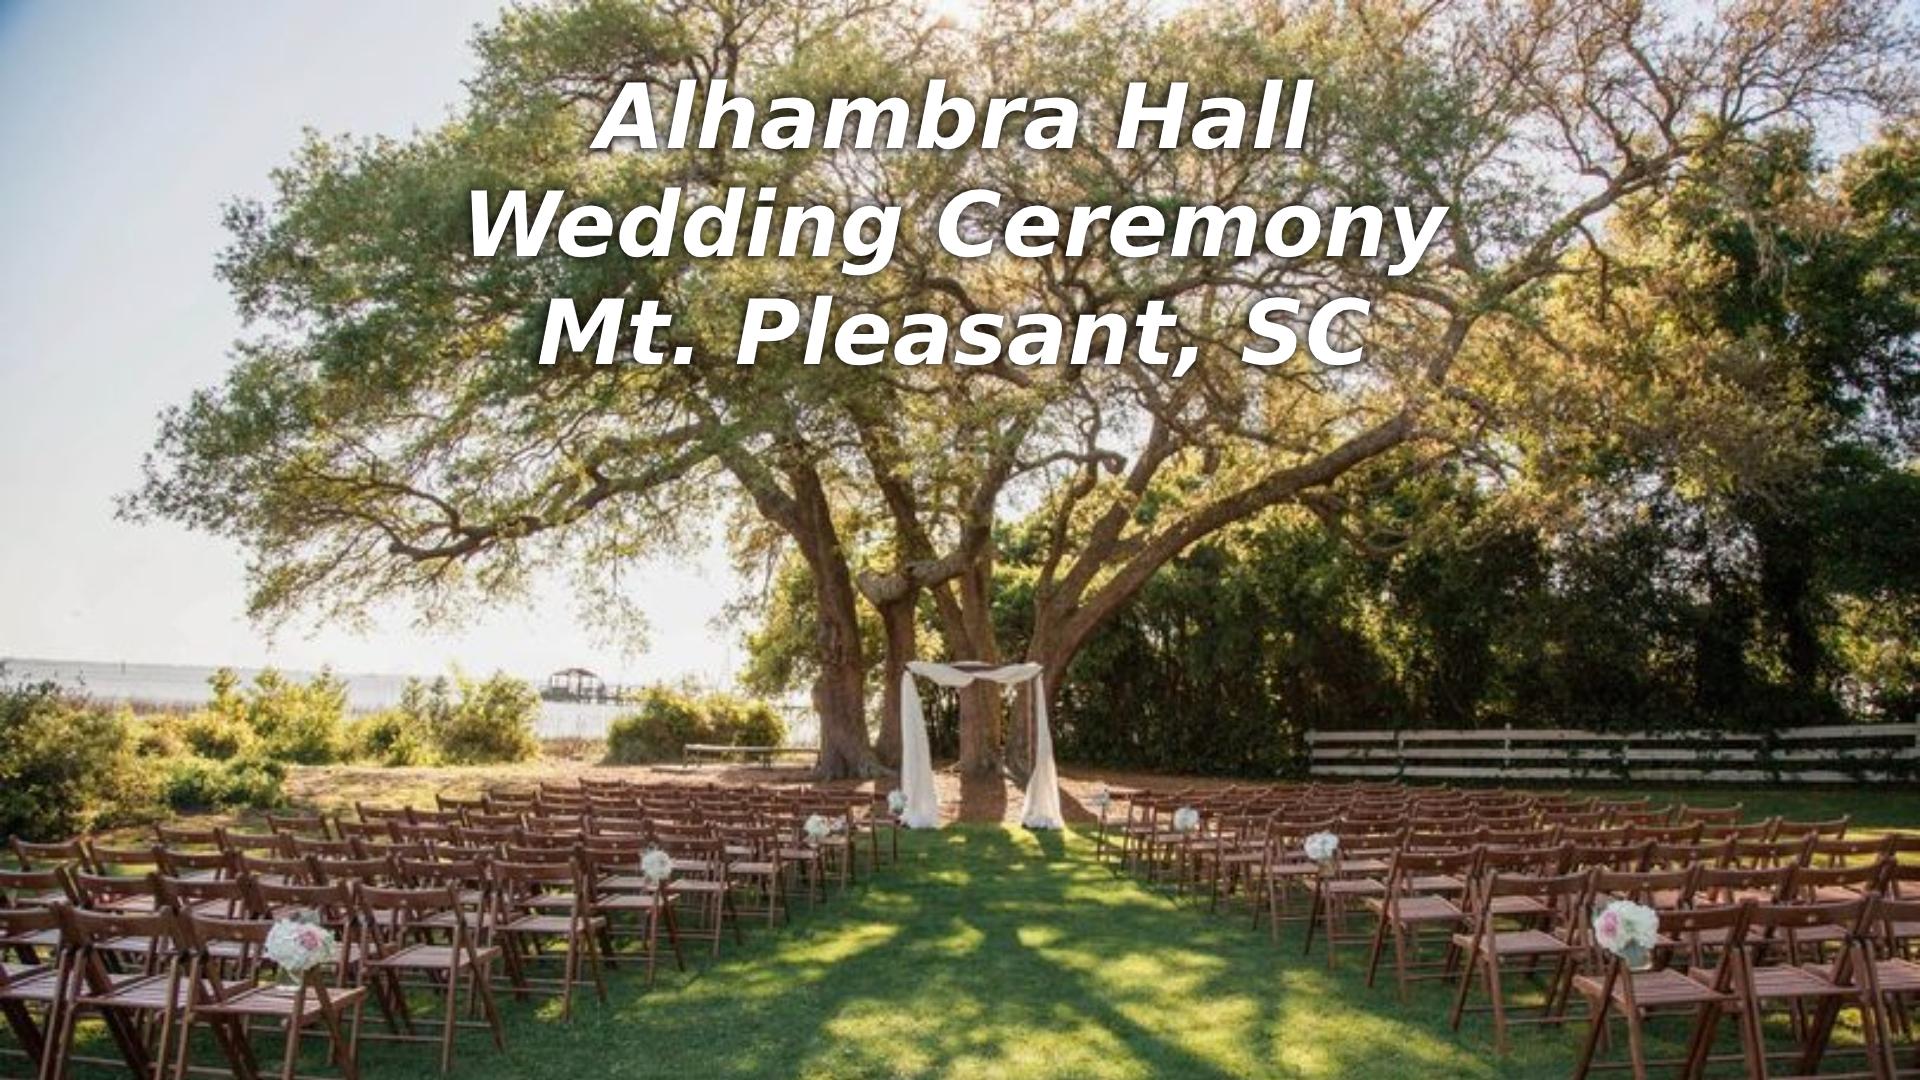 Alhambra Hall Wedding Ceremony